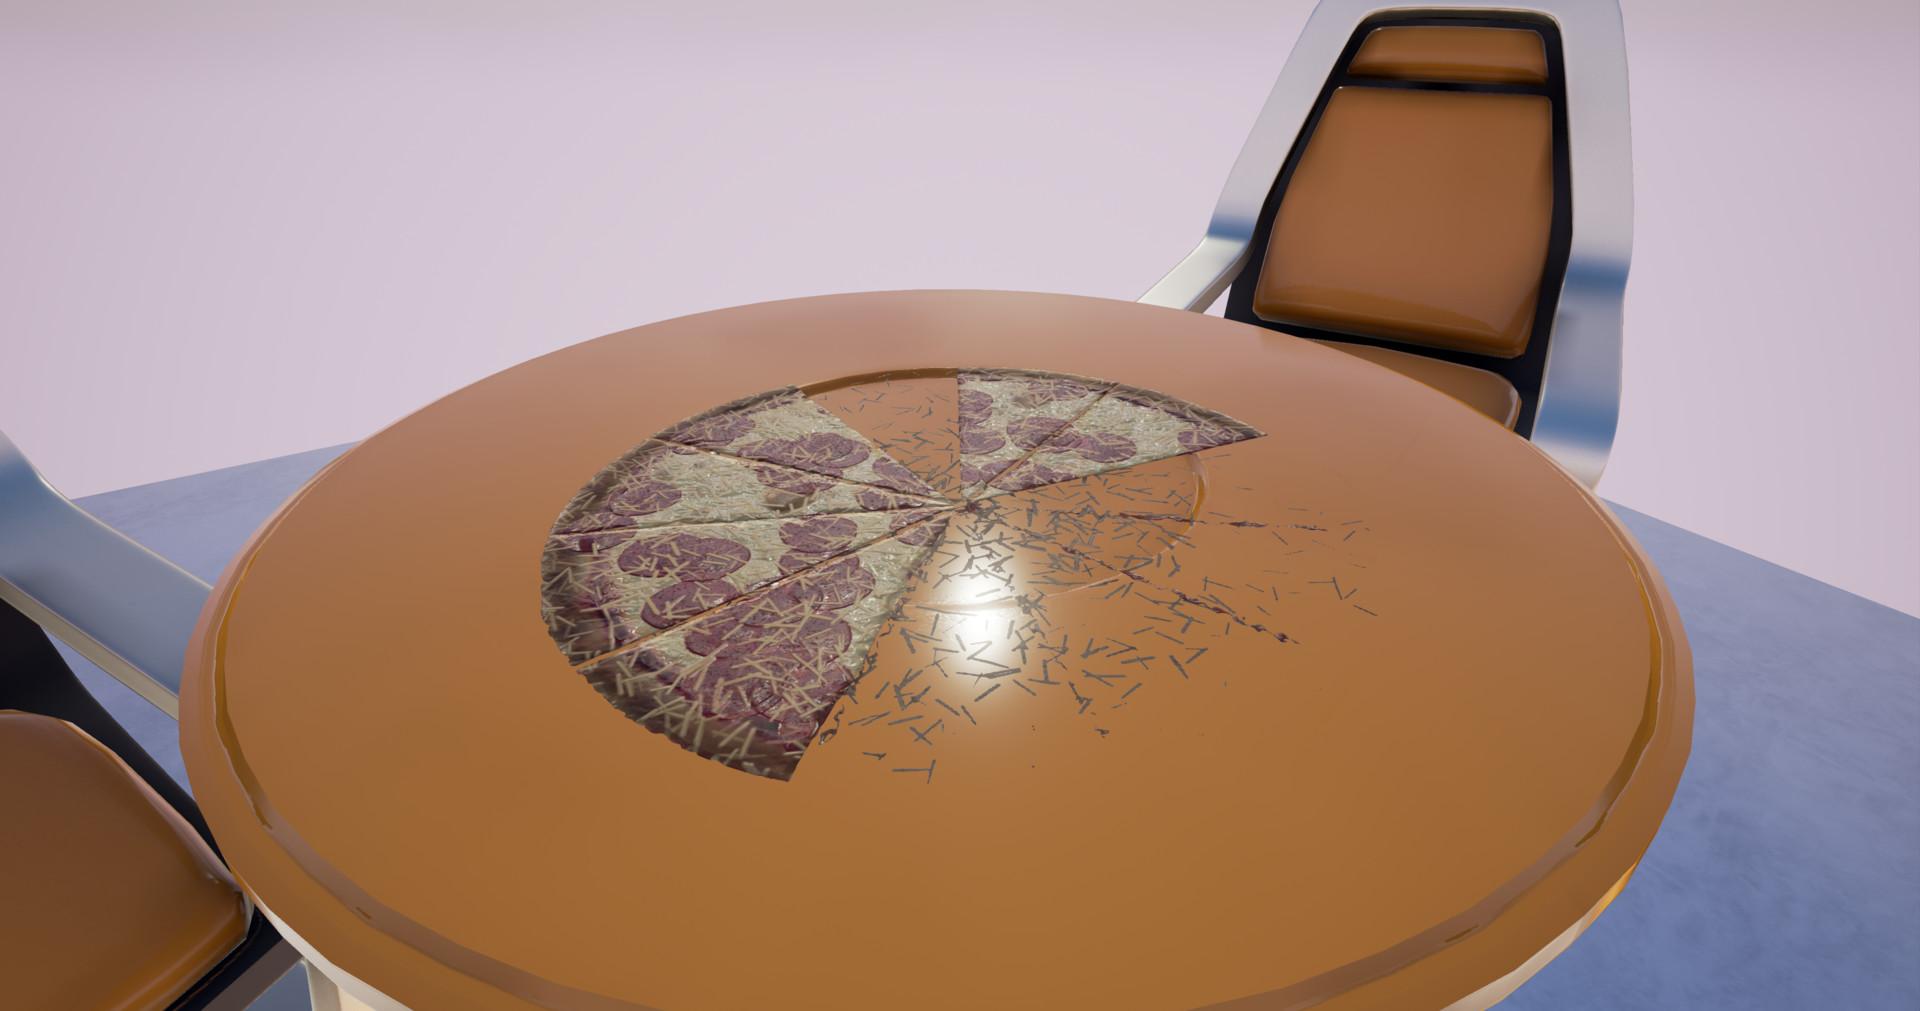 Osman samano pizza circ 2